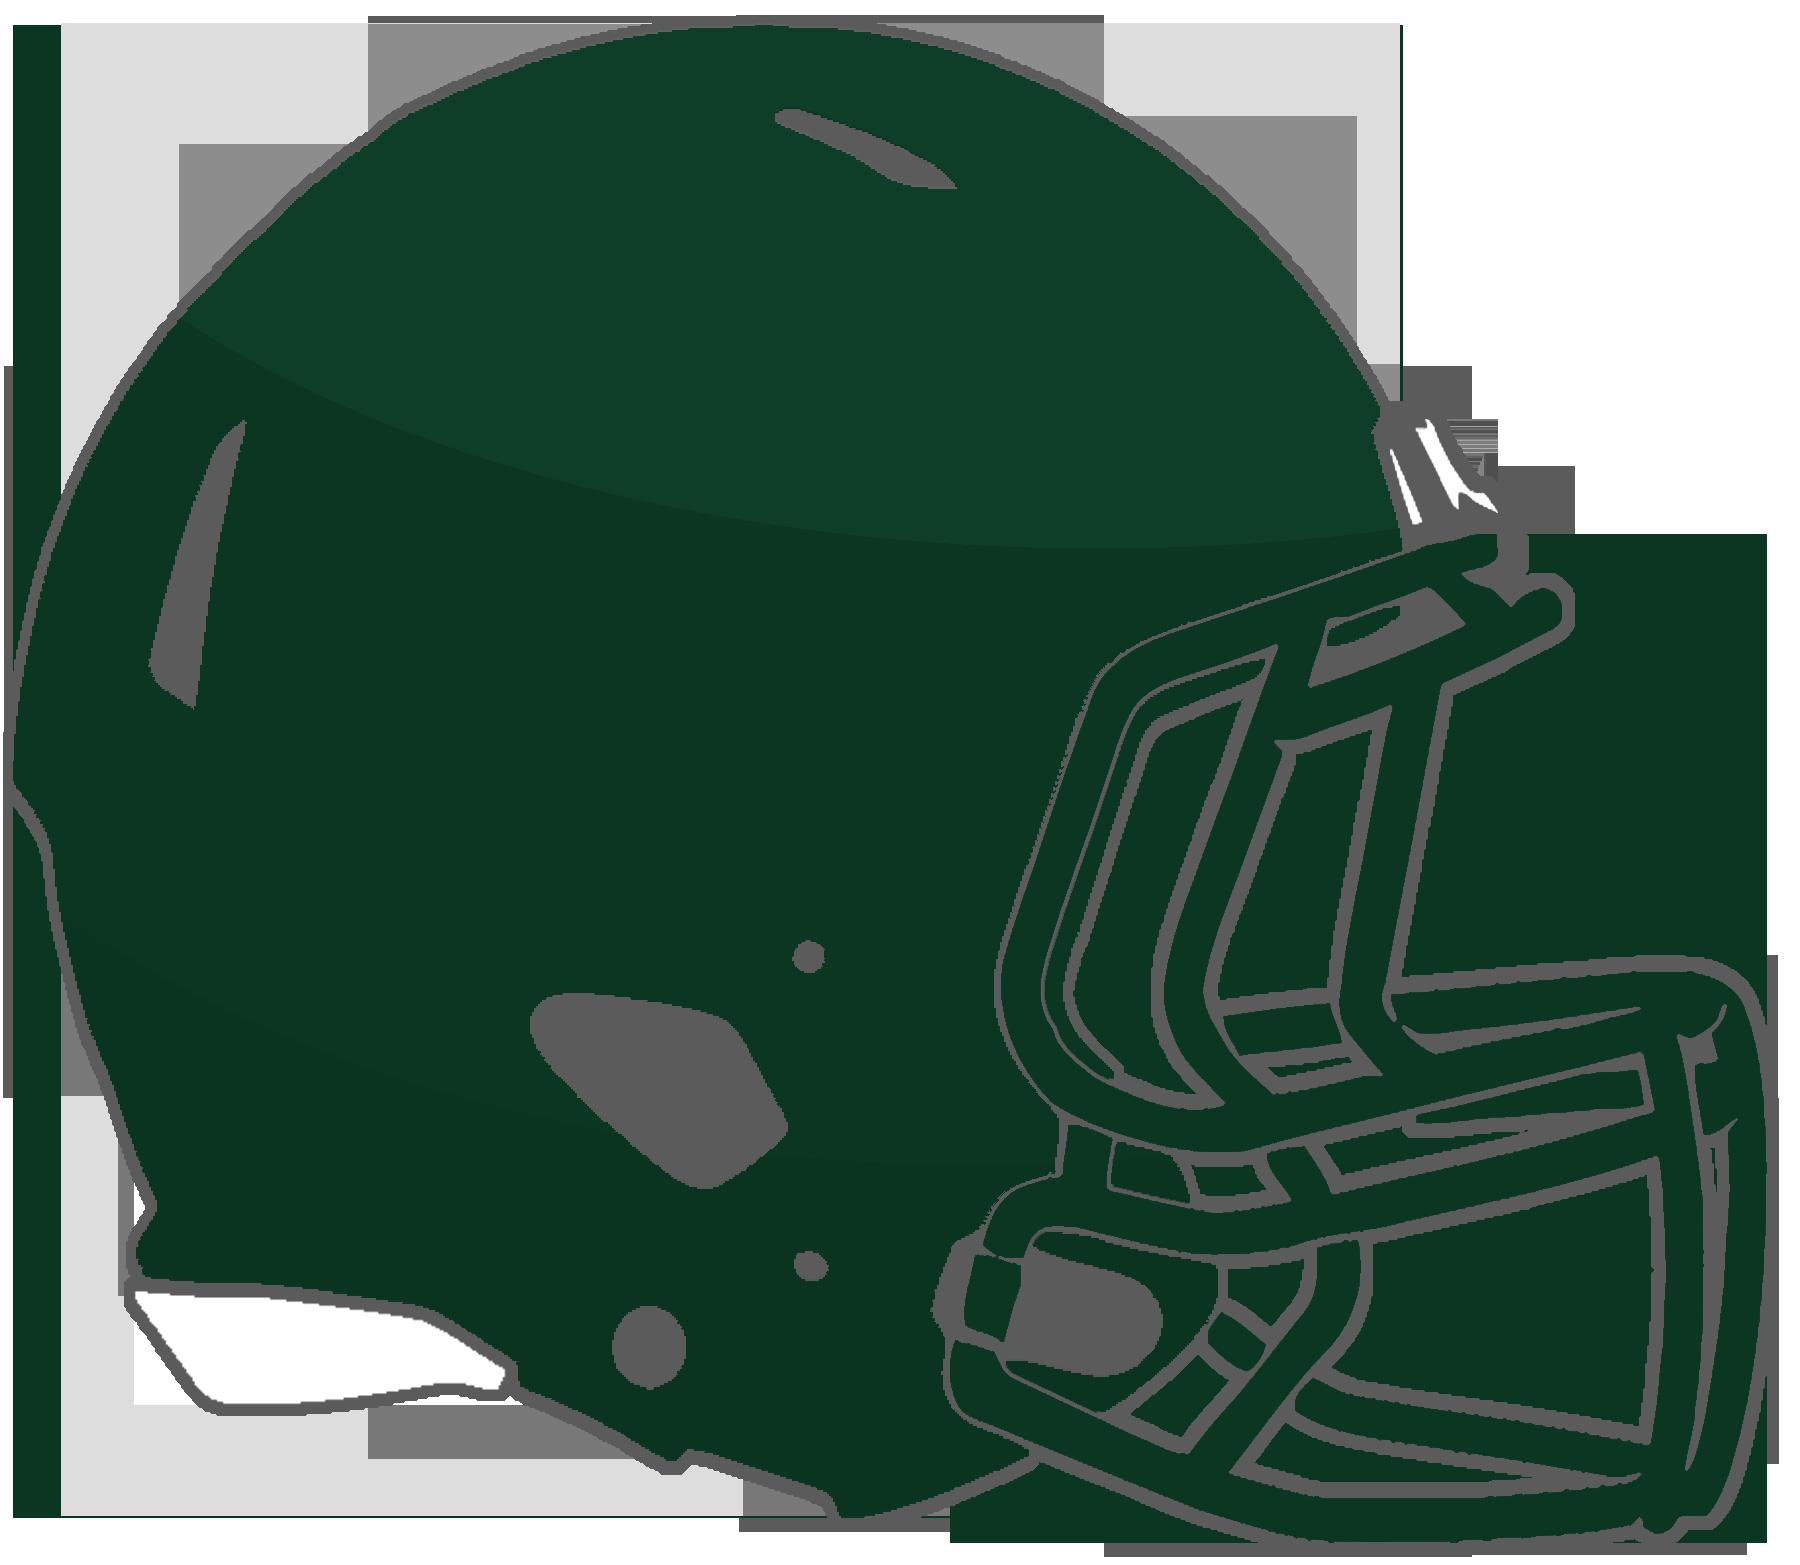 Green football clipart helmet against helmet graphic royalty free stock Mississippi High School Football Helmets: 1A graphic royalty free stock